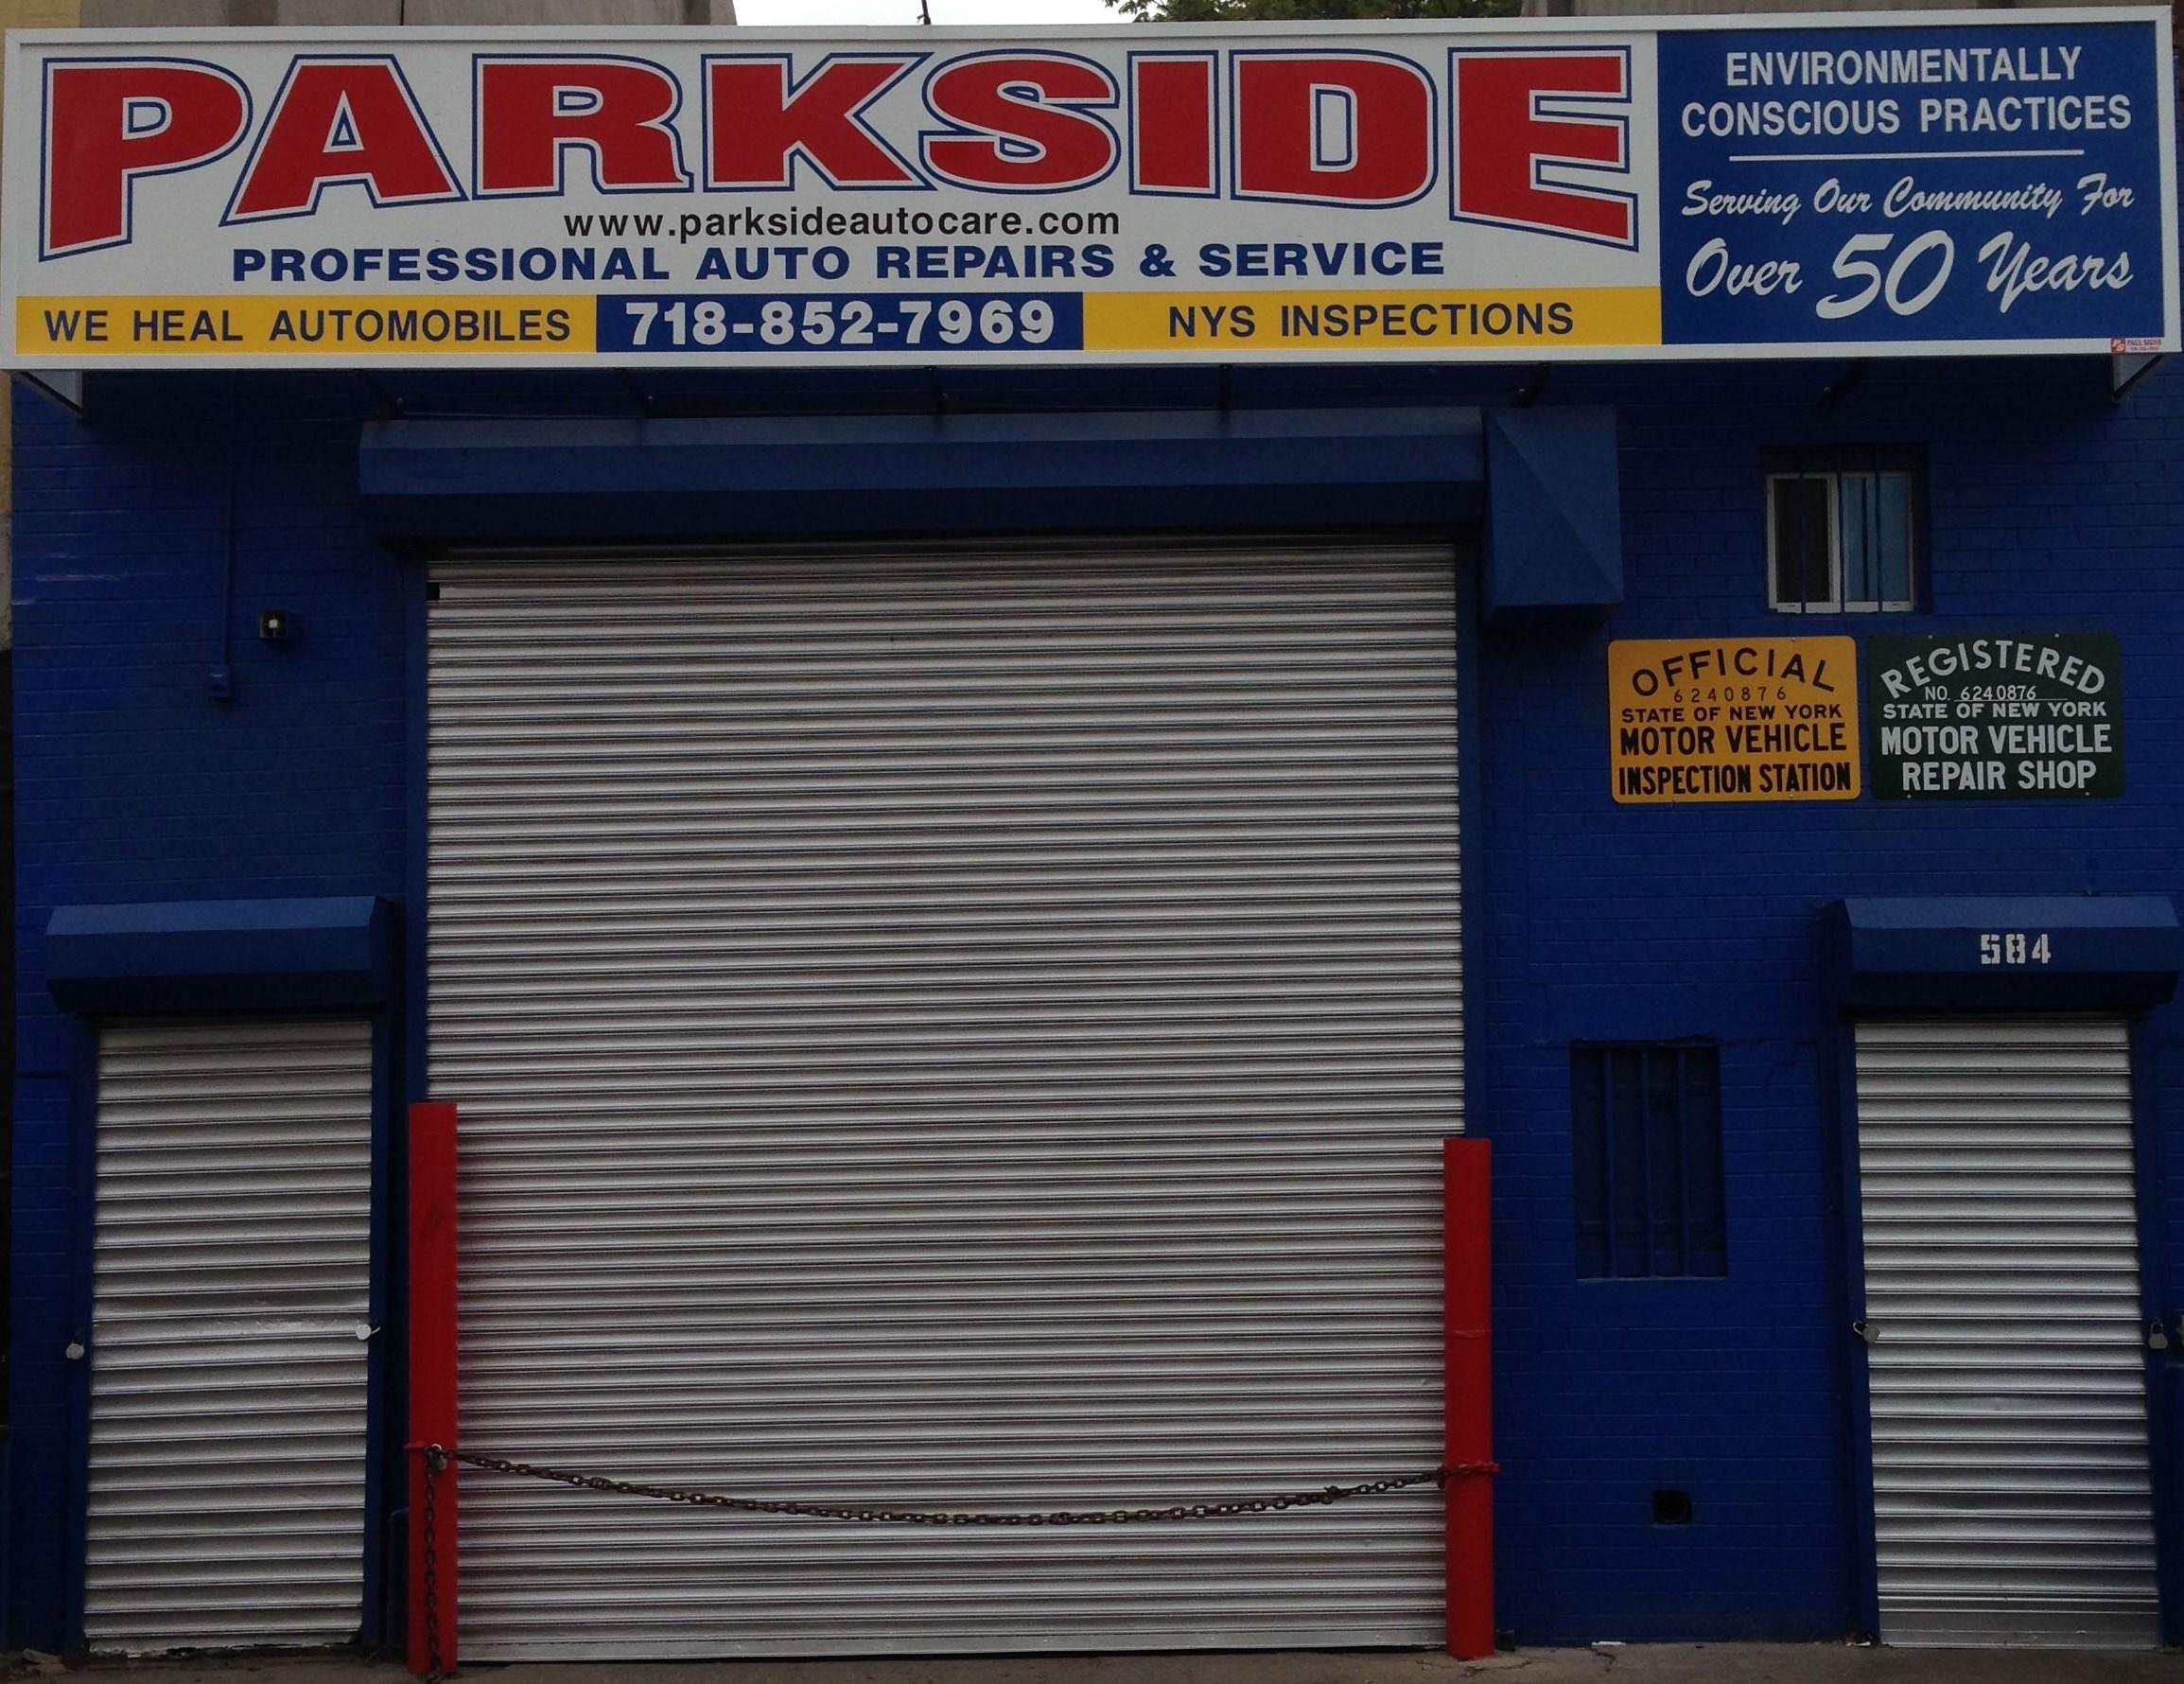 Parkside Auto Care 584 Union Street Brooklyn Ny 11215